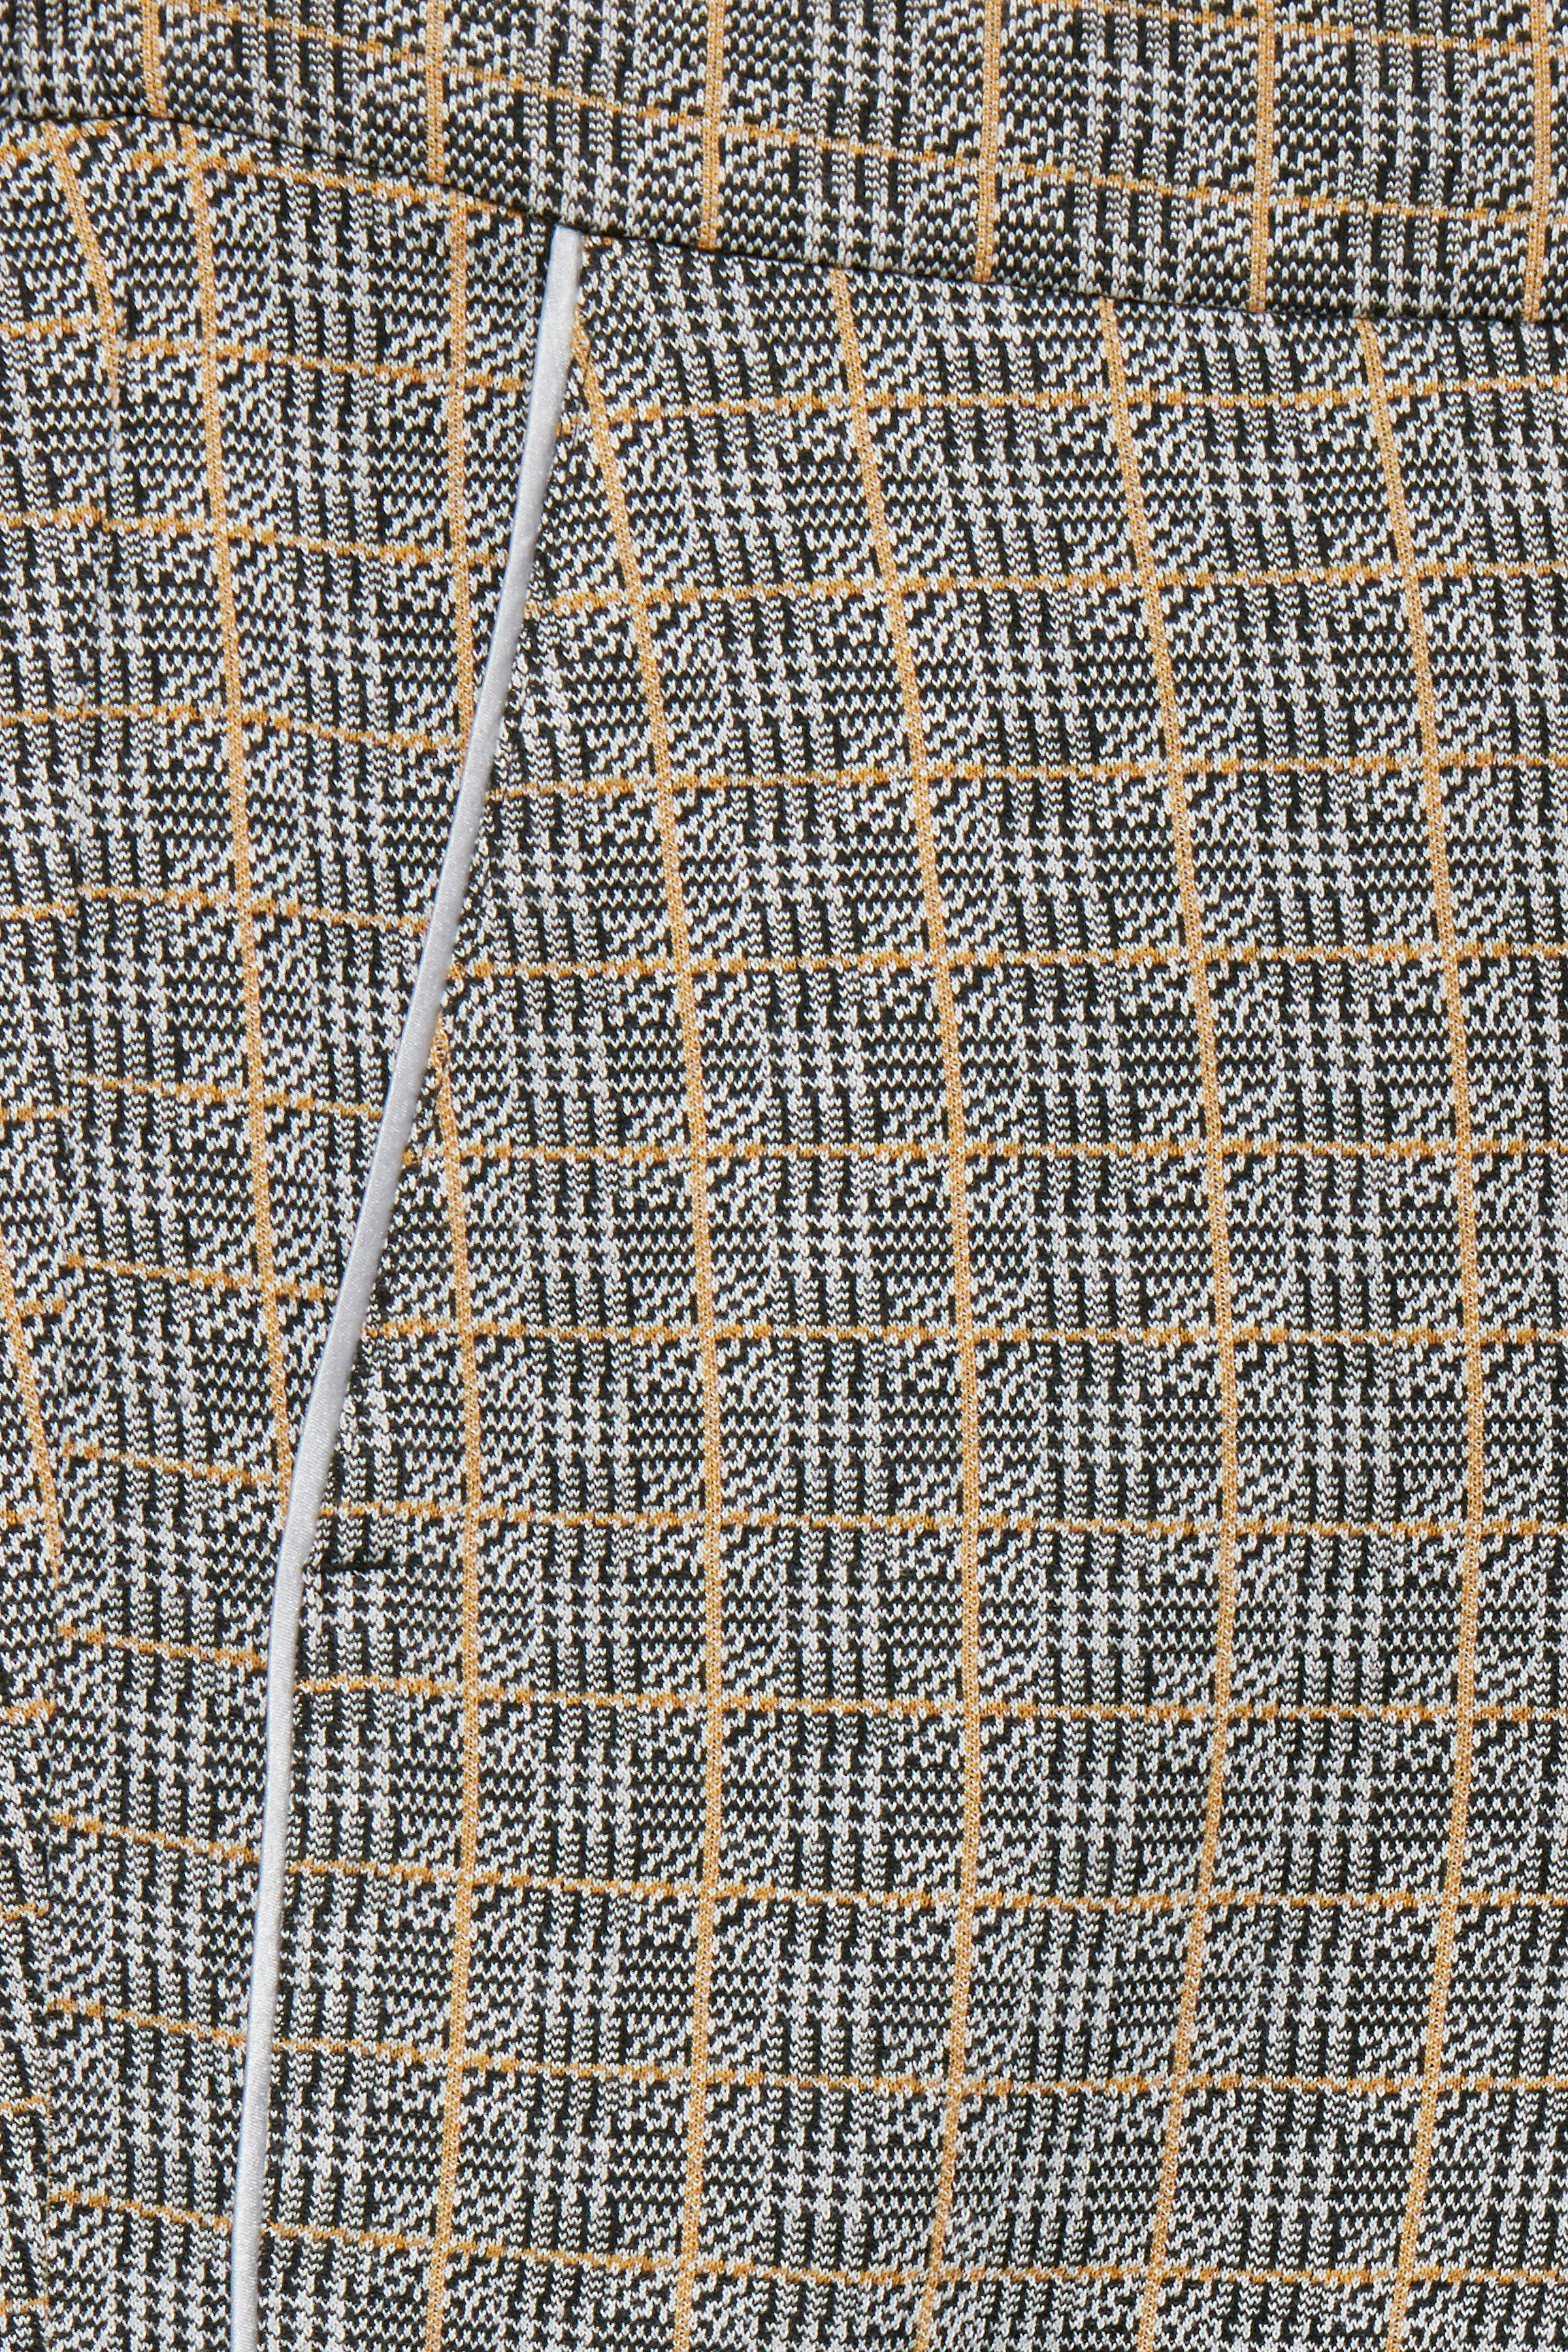 Svart/off-white Casual byxor från Pulz Jeans – Köp Svart/off-white Casual byxor från stl. 32-46 här